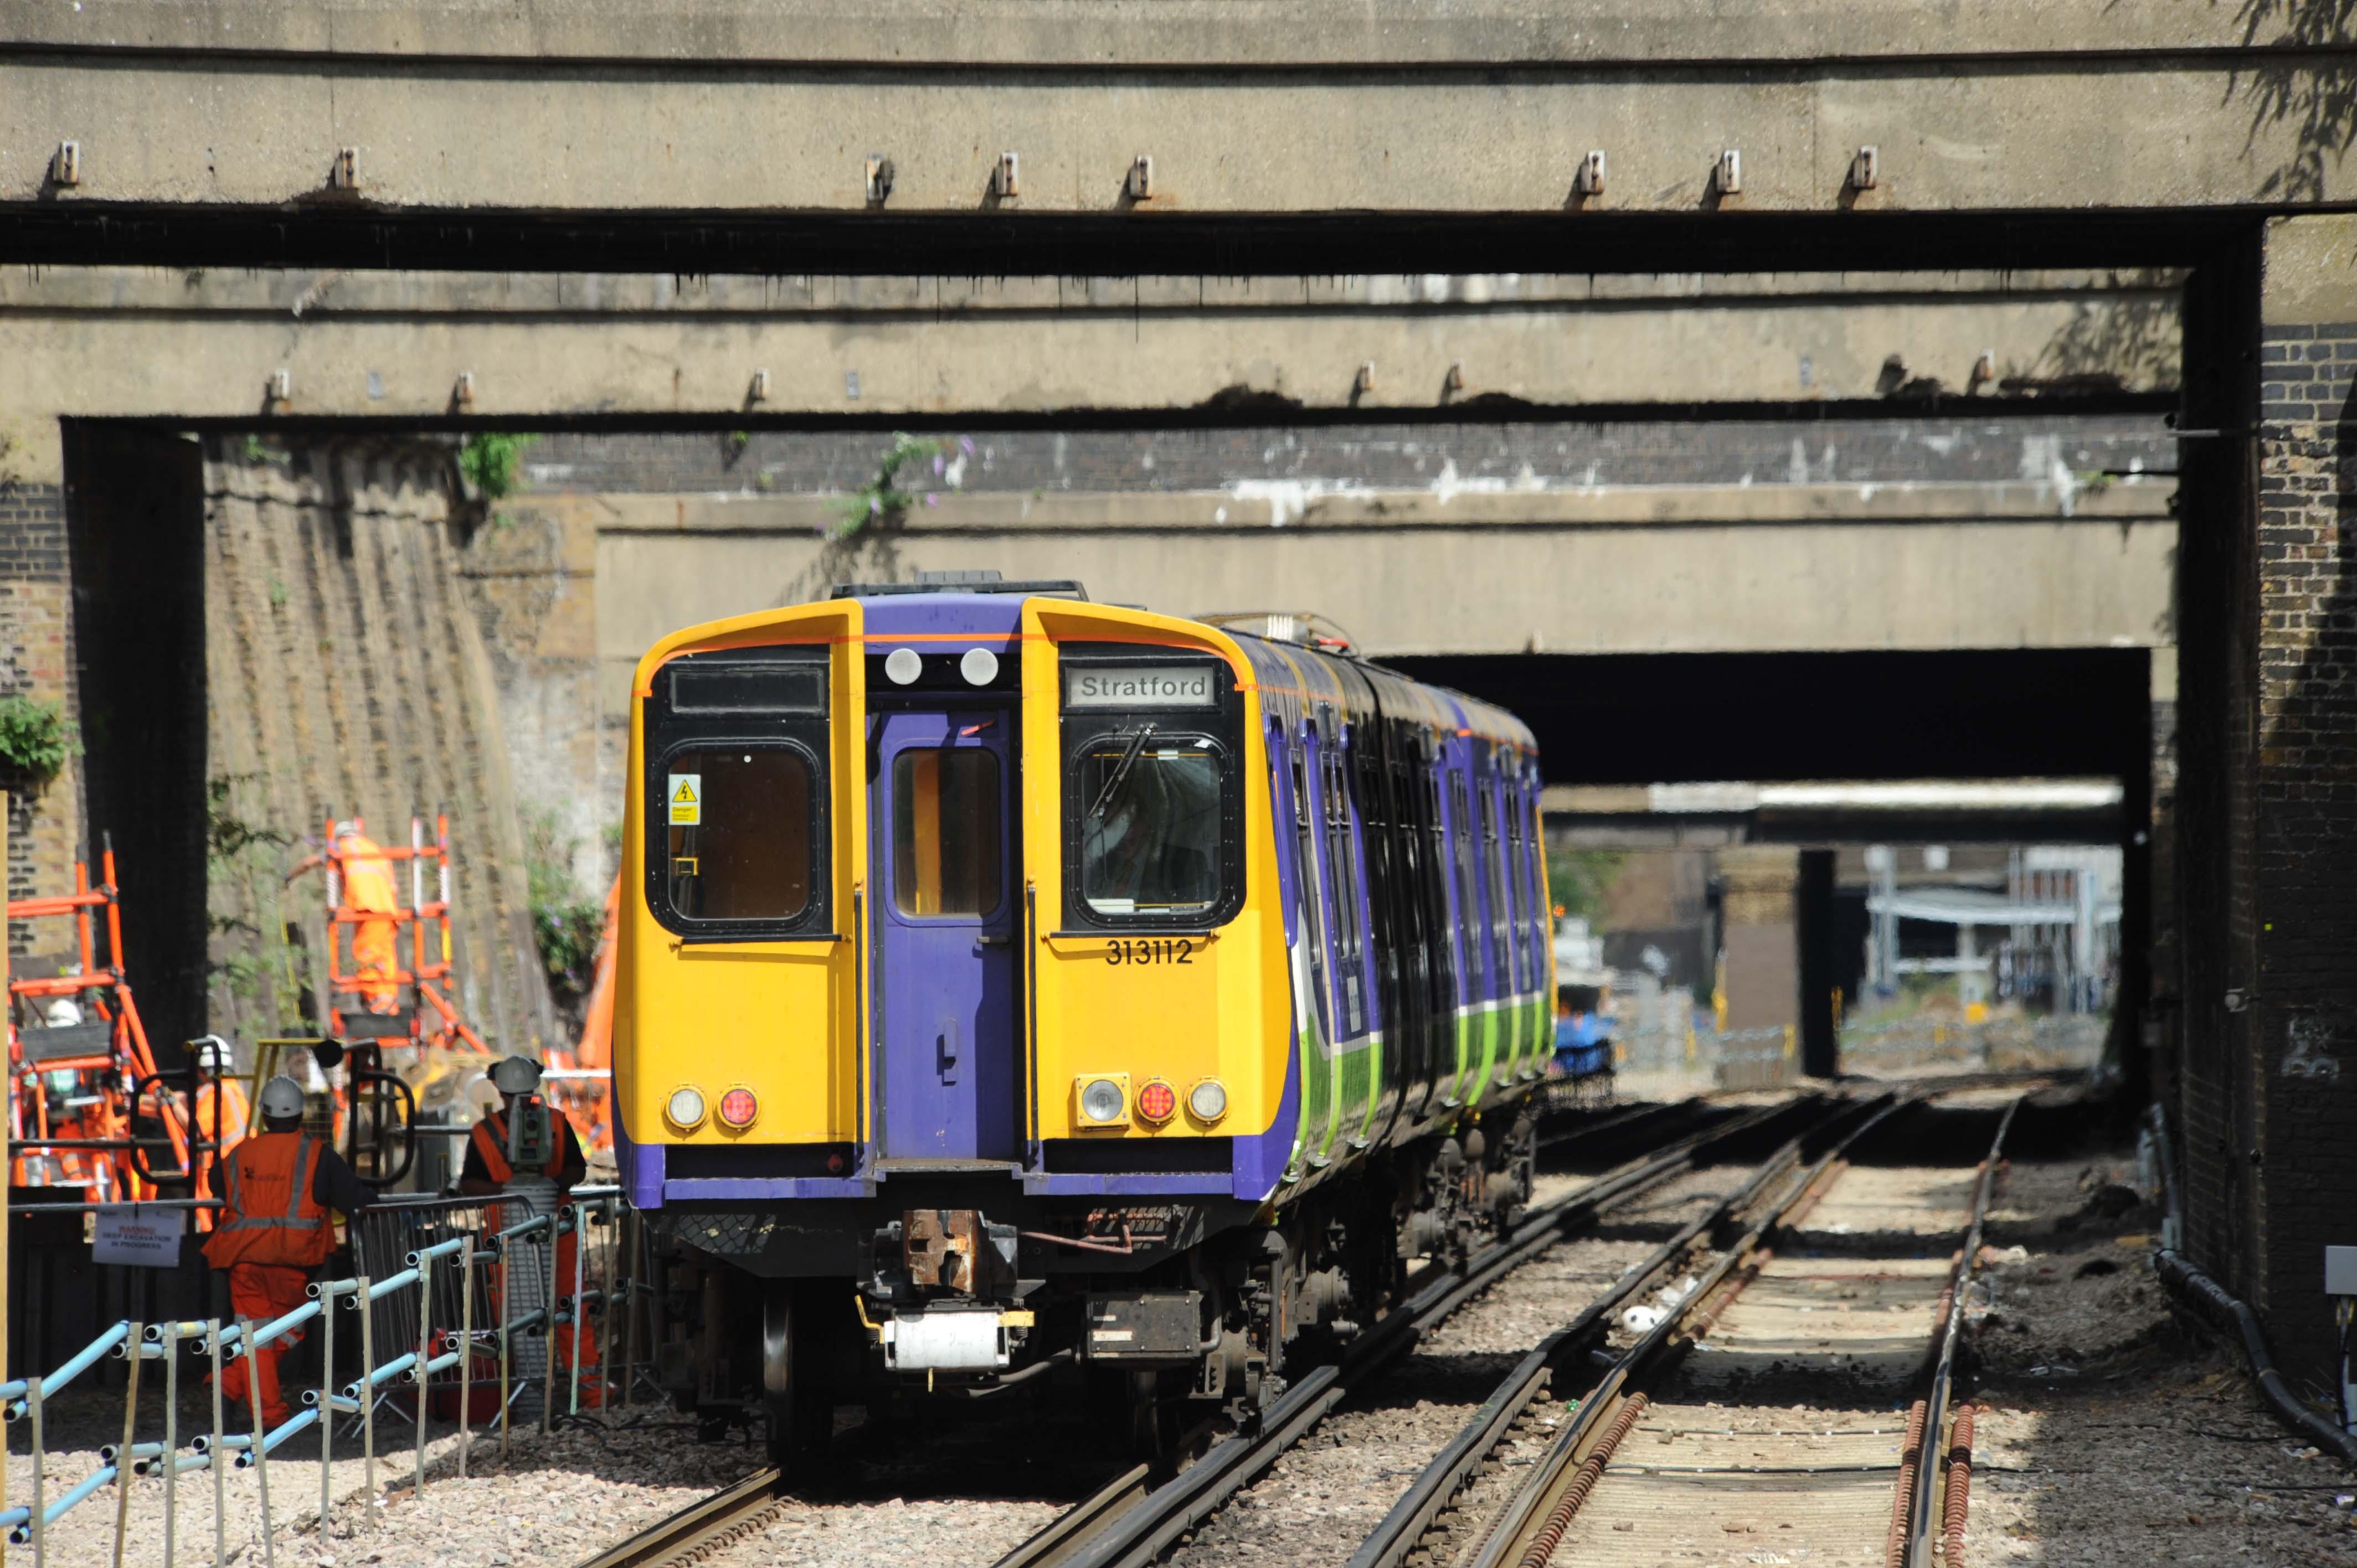 DG29836. 313112. Caledonian Rd and Barnsbury. 31.7.09.